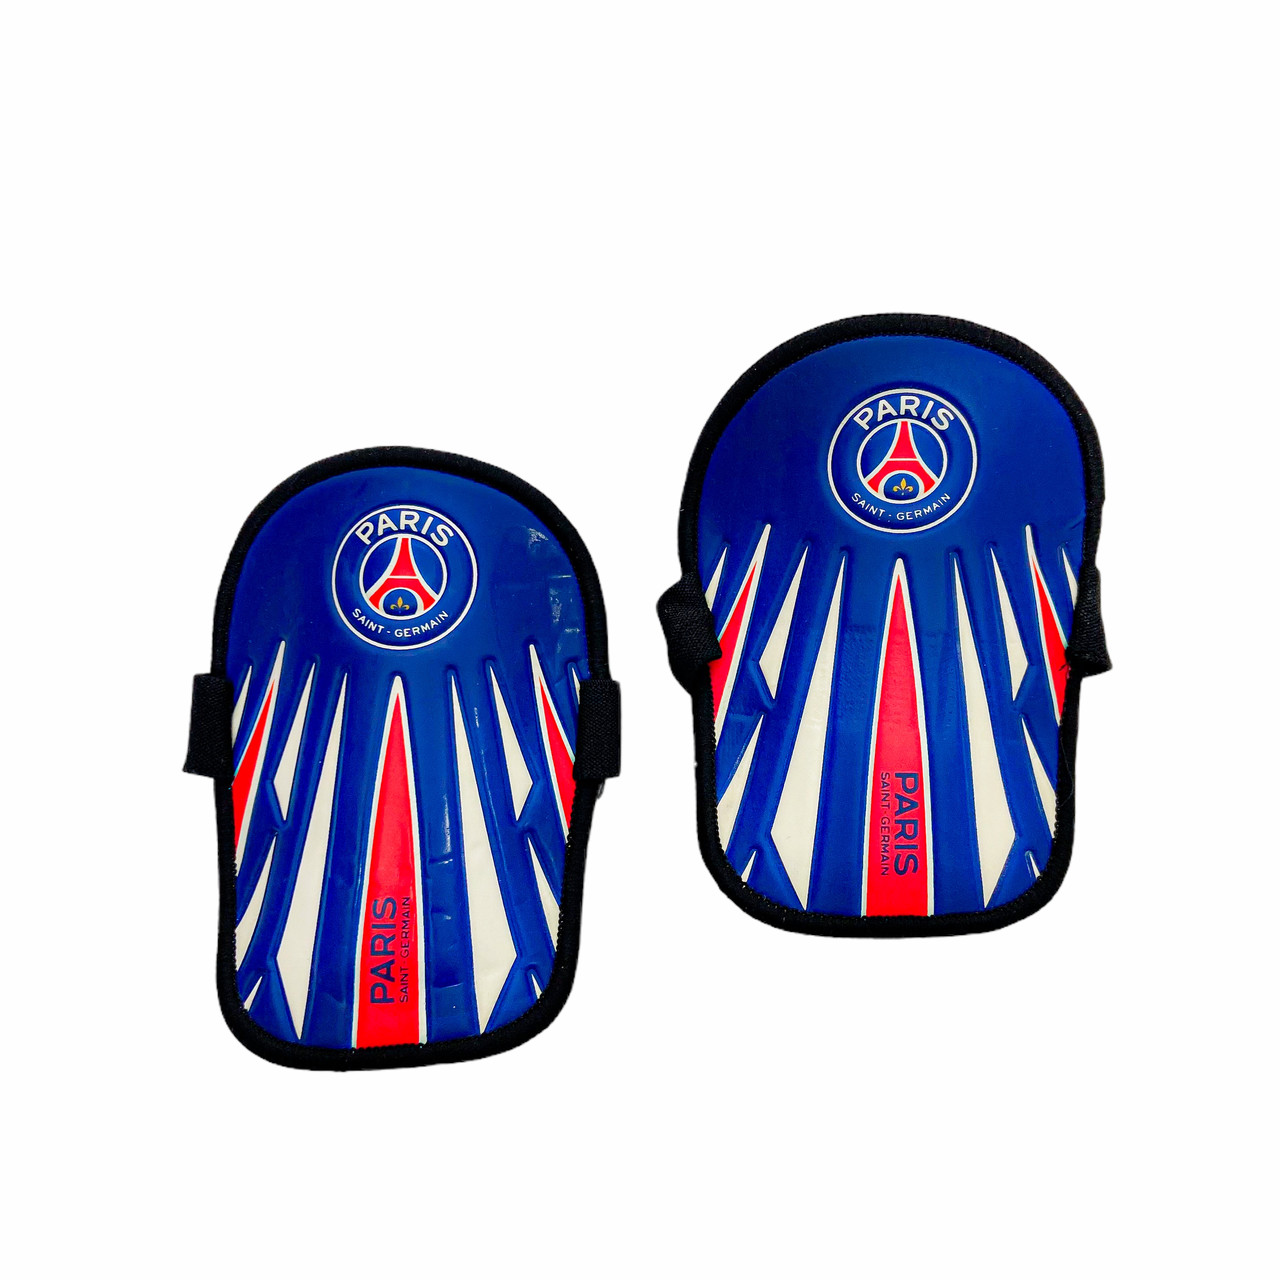 Caneleira PSG Paris Saint-Germain Infantil TAM. XS Sportcom